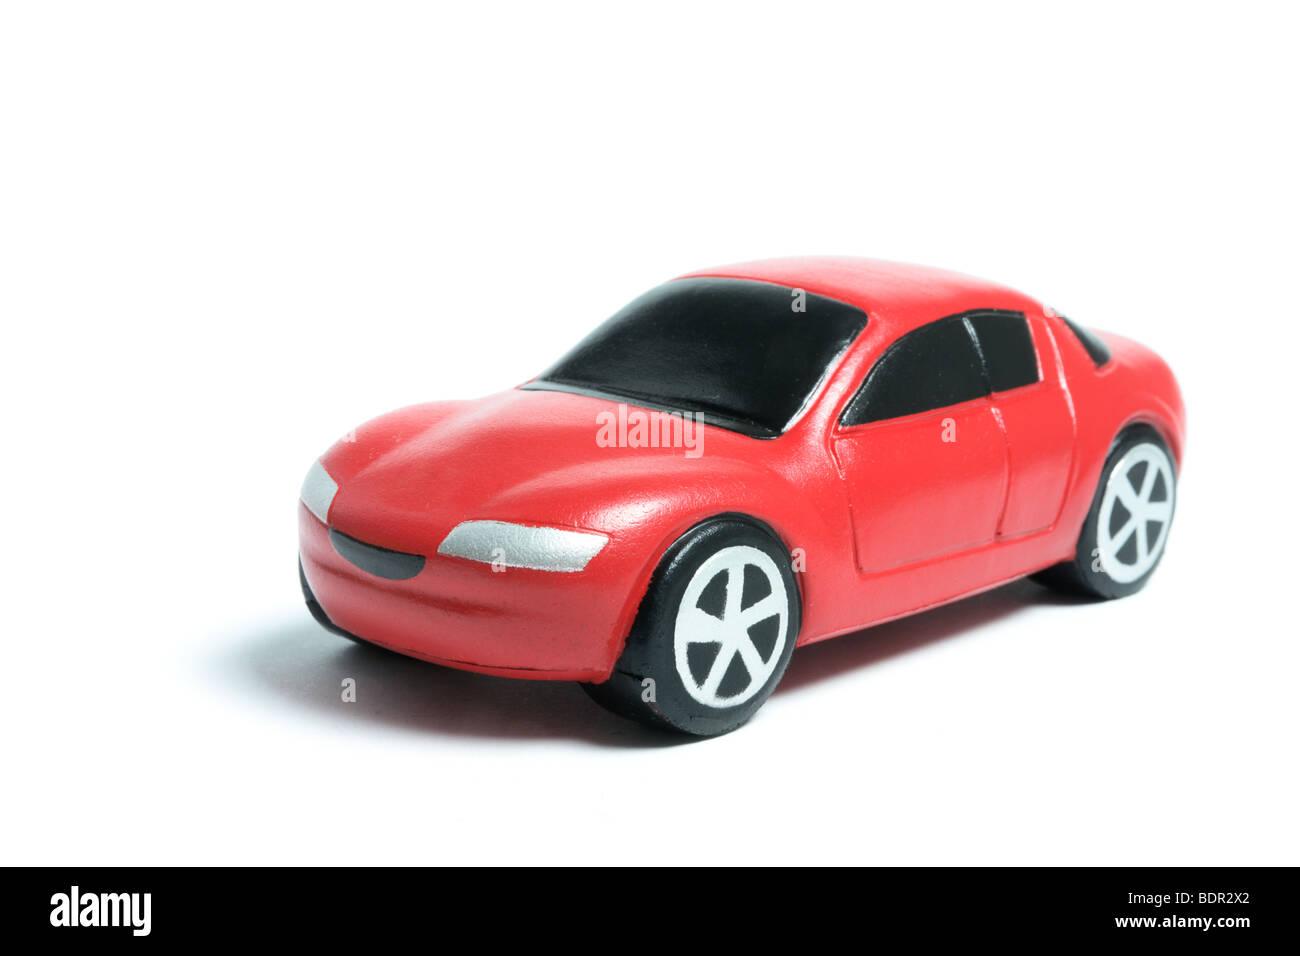 Miniature Car Stock Photo